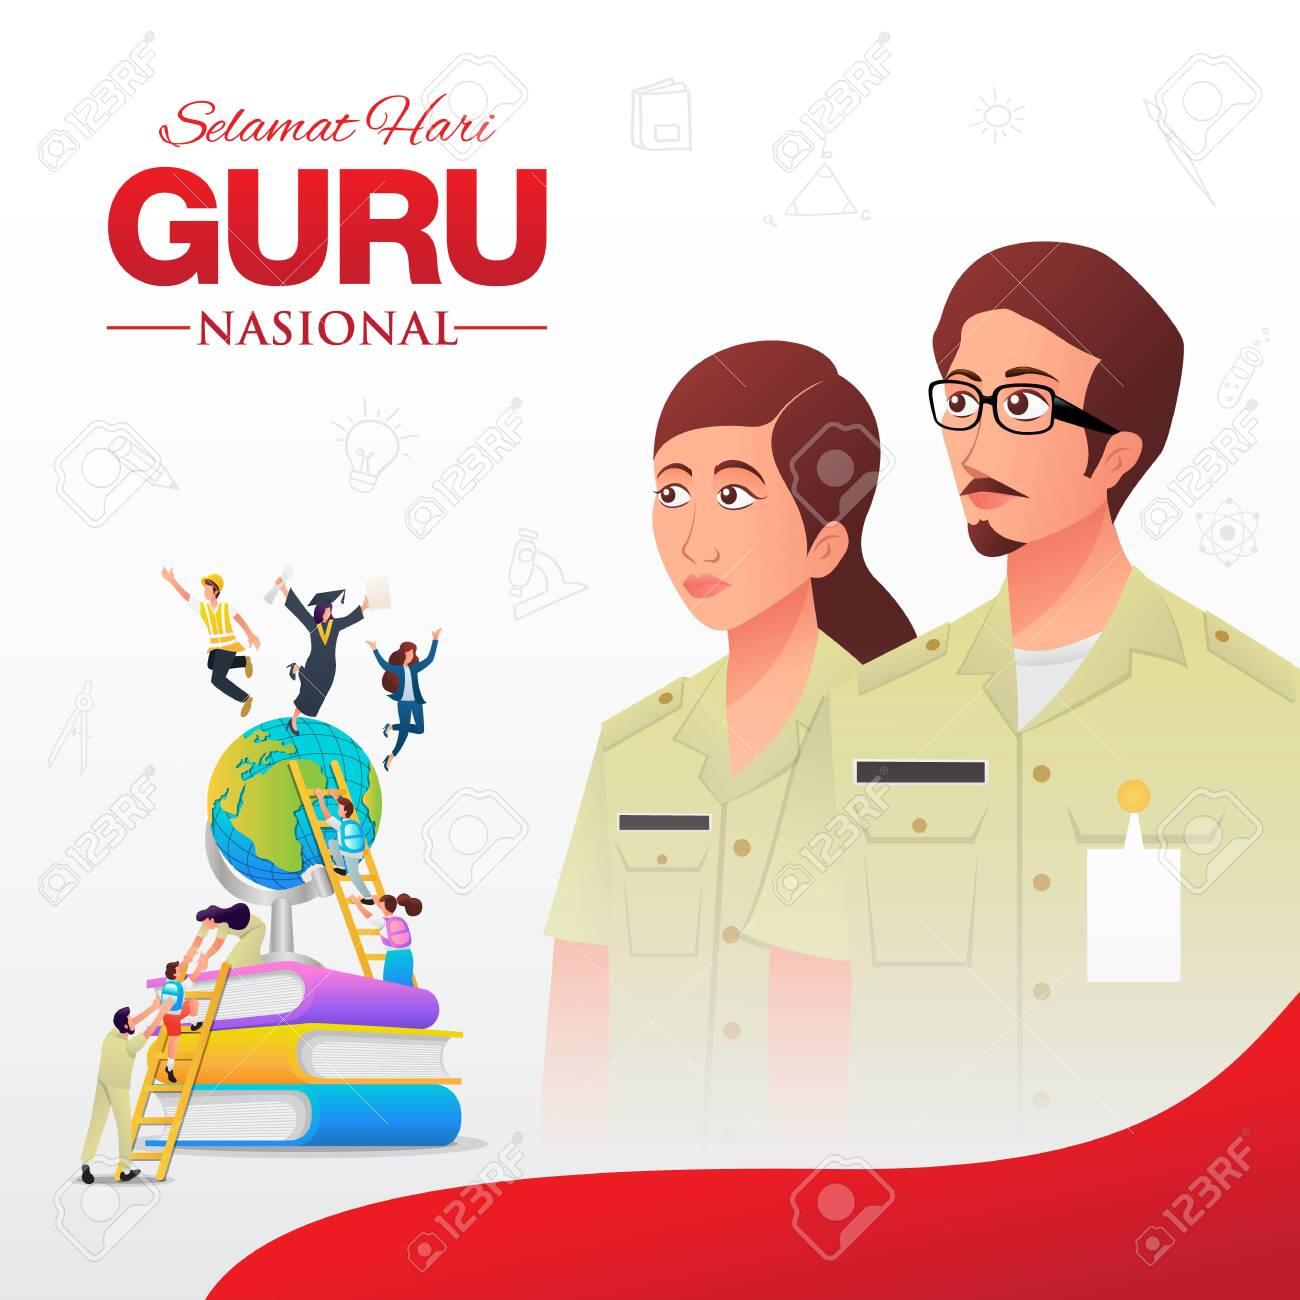 Selamat Hari Guru Nasional Translation Happy Indonesian National Royalty Free Cliparts Vectors And Stock Illustration Image 153317330